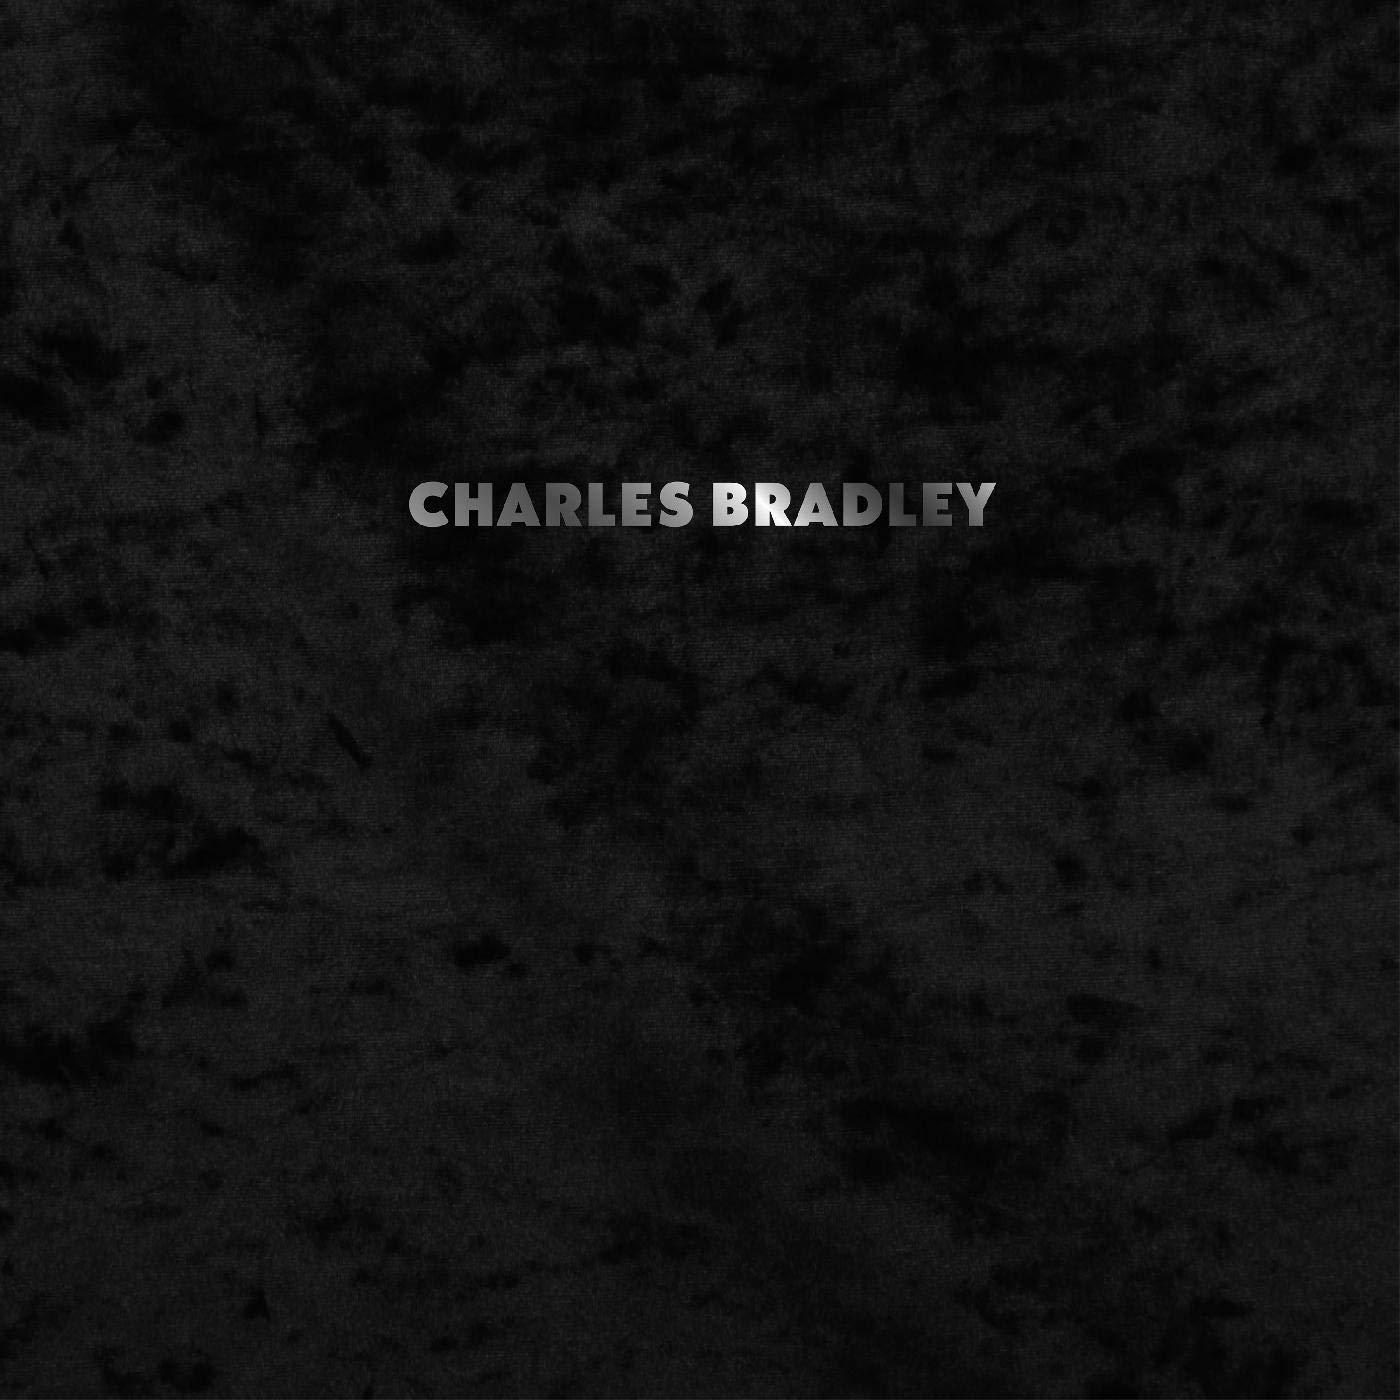 Black Velvet (Limited Edition Deluxe LP Box Set)